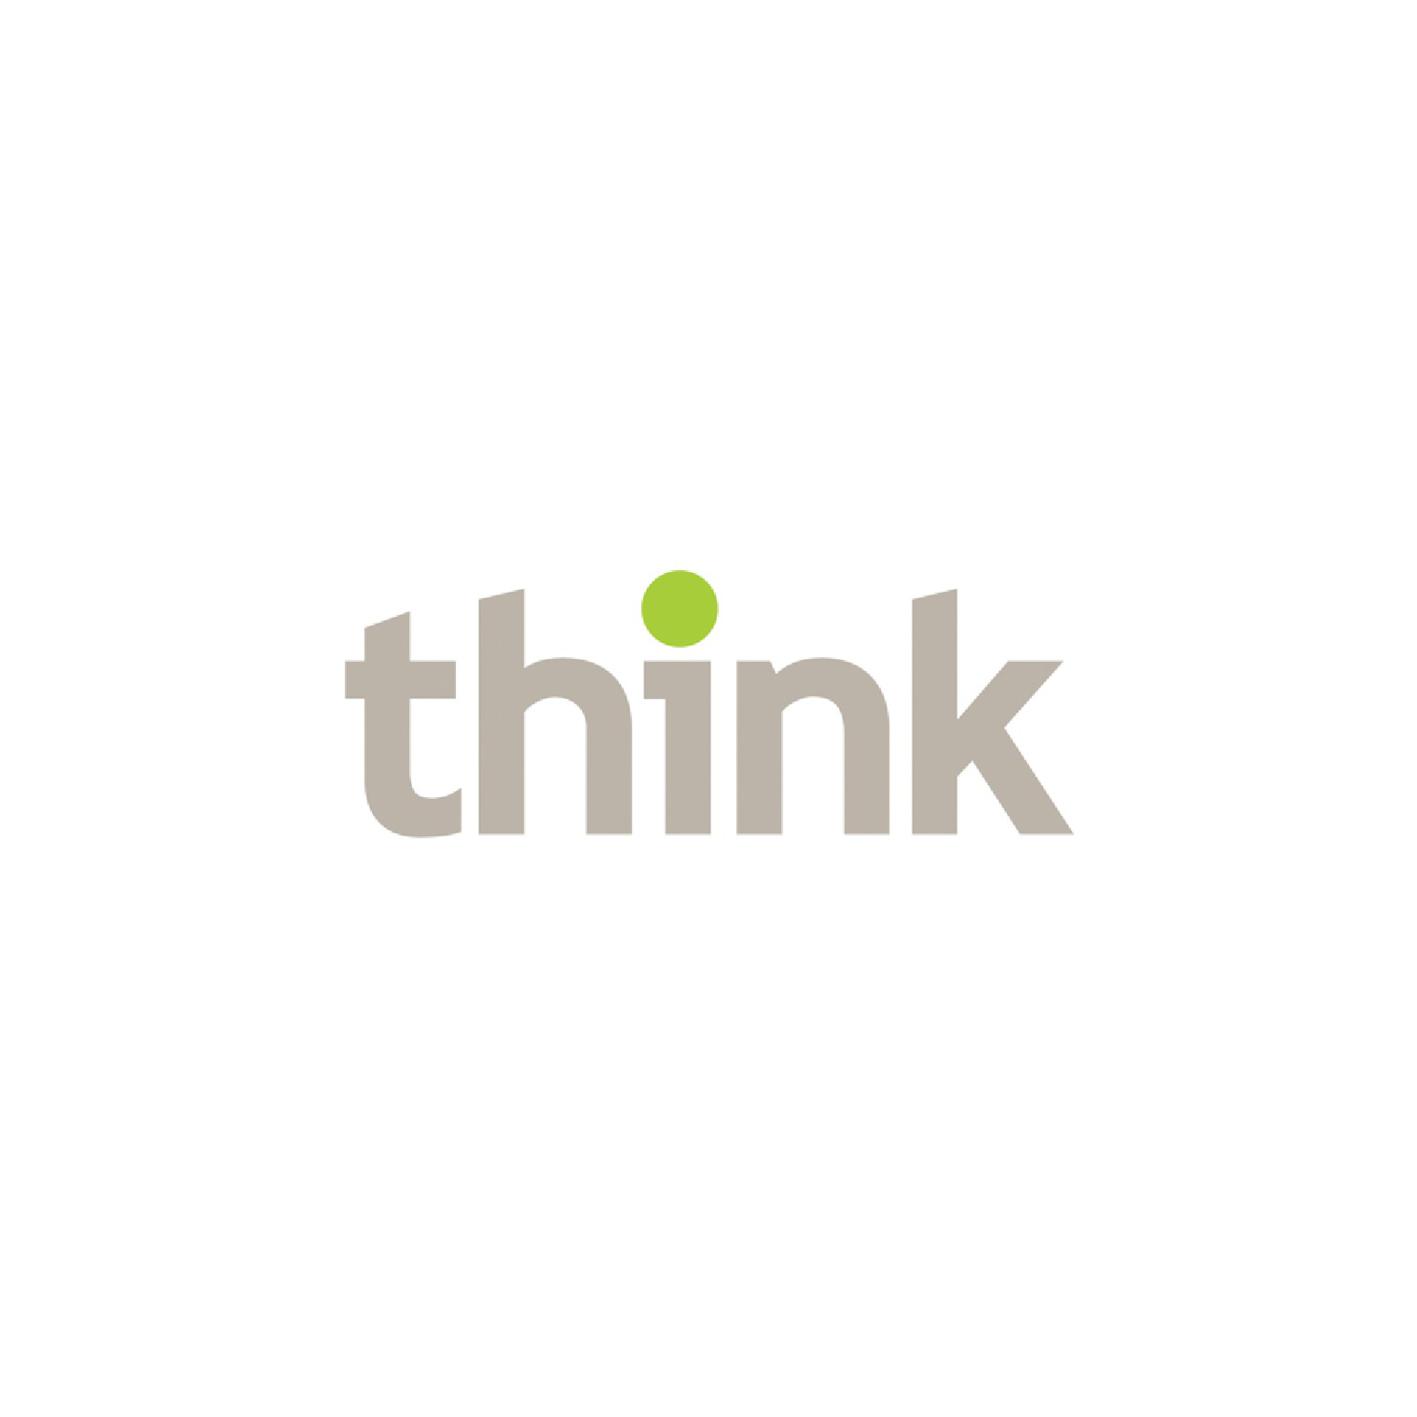 Think Green Logo Think Green View Bio View